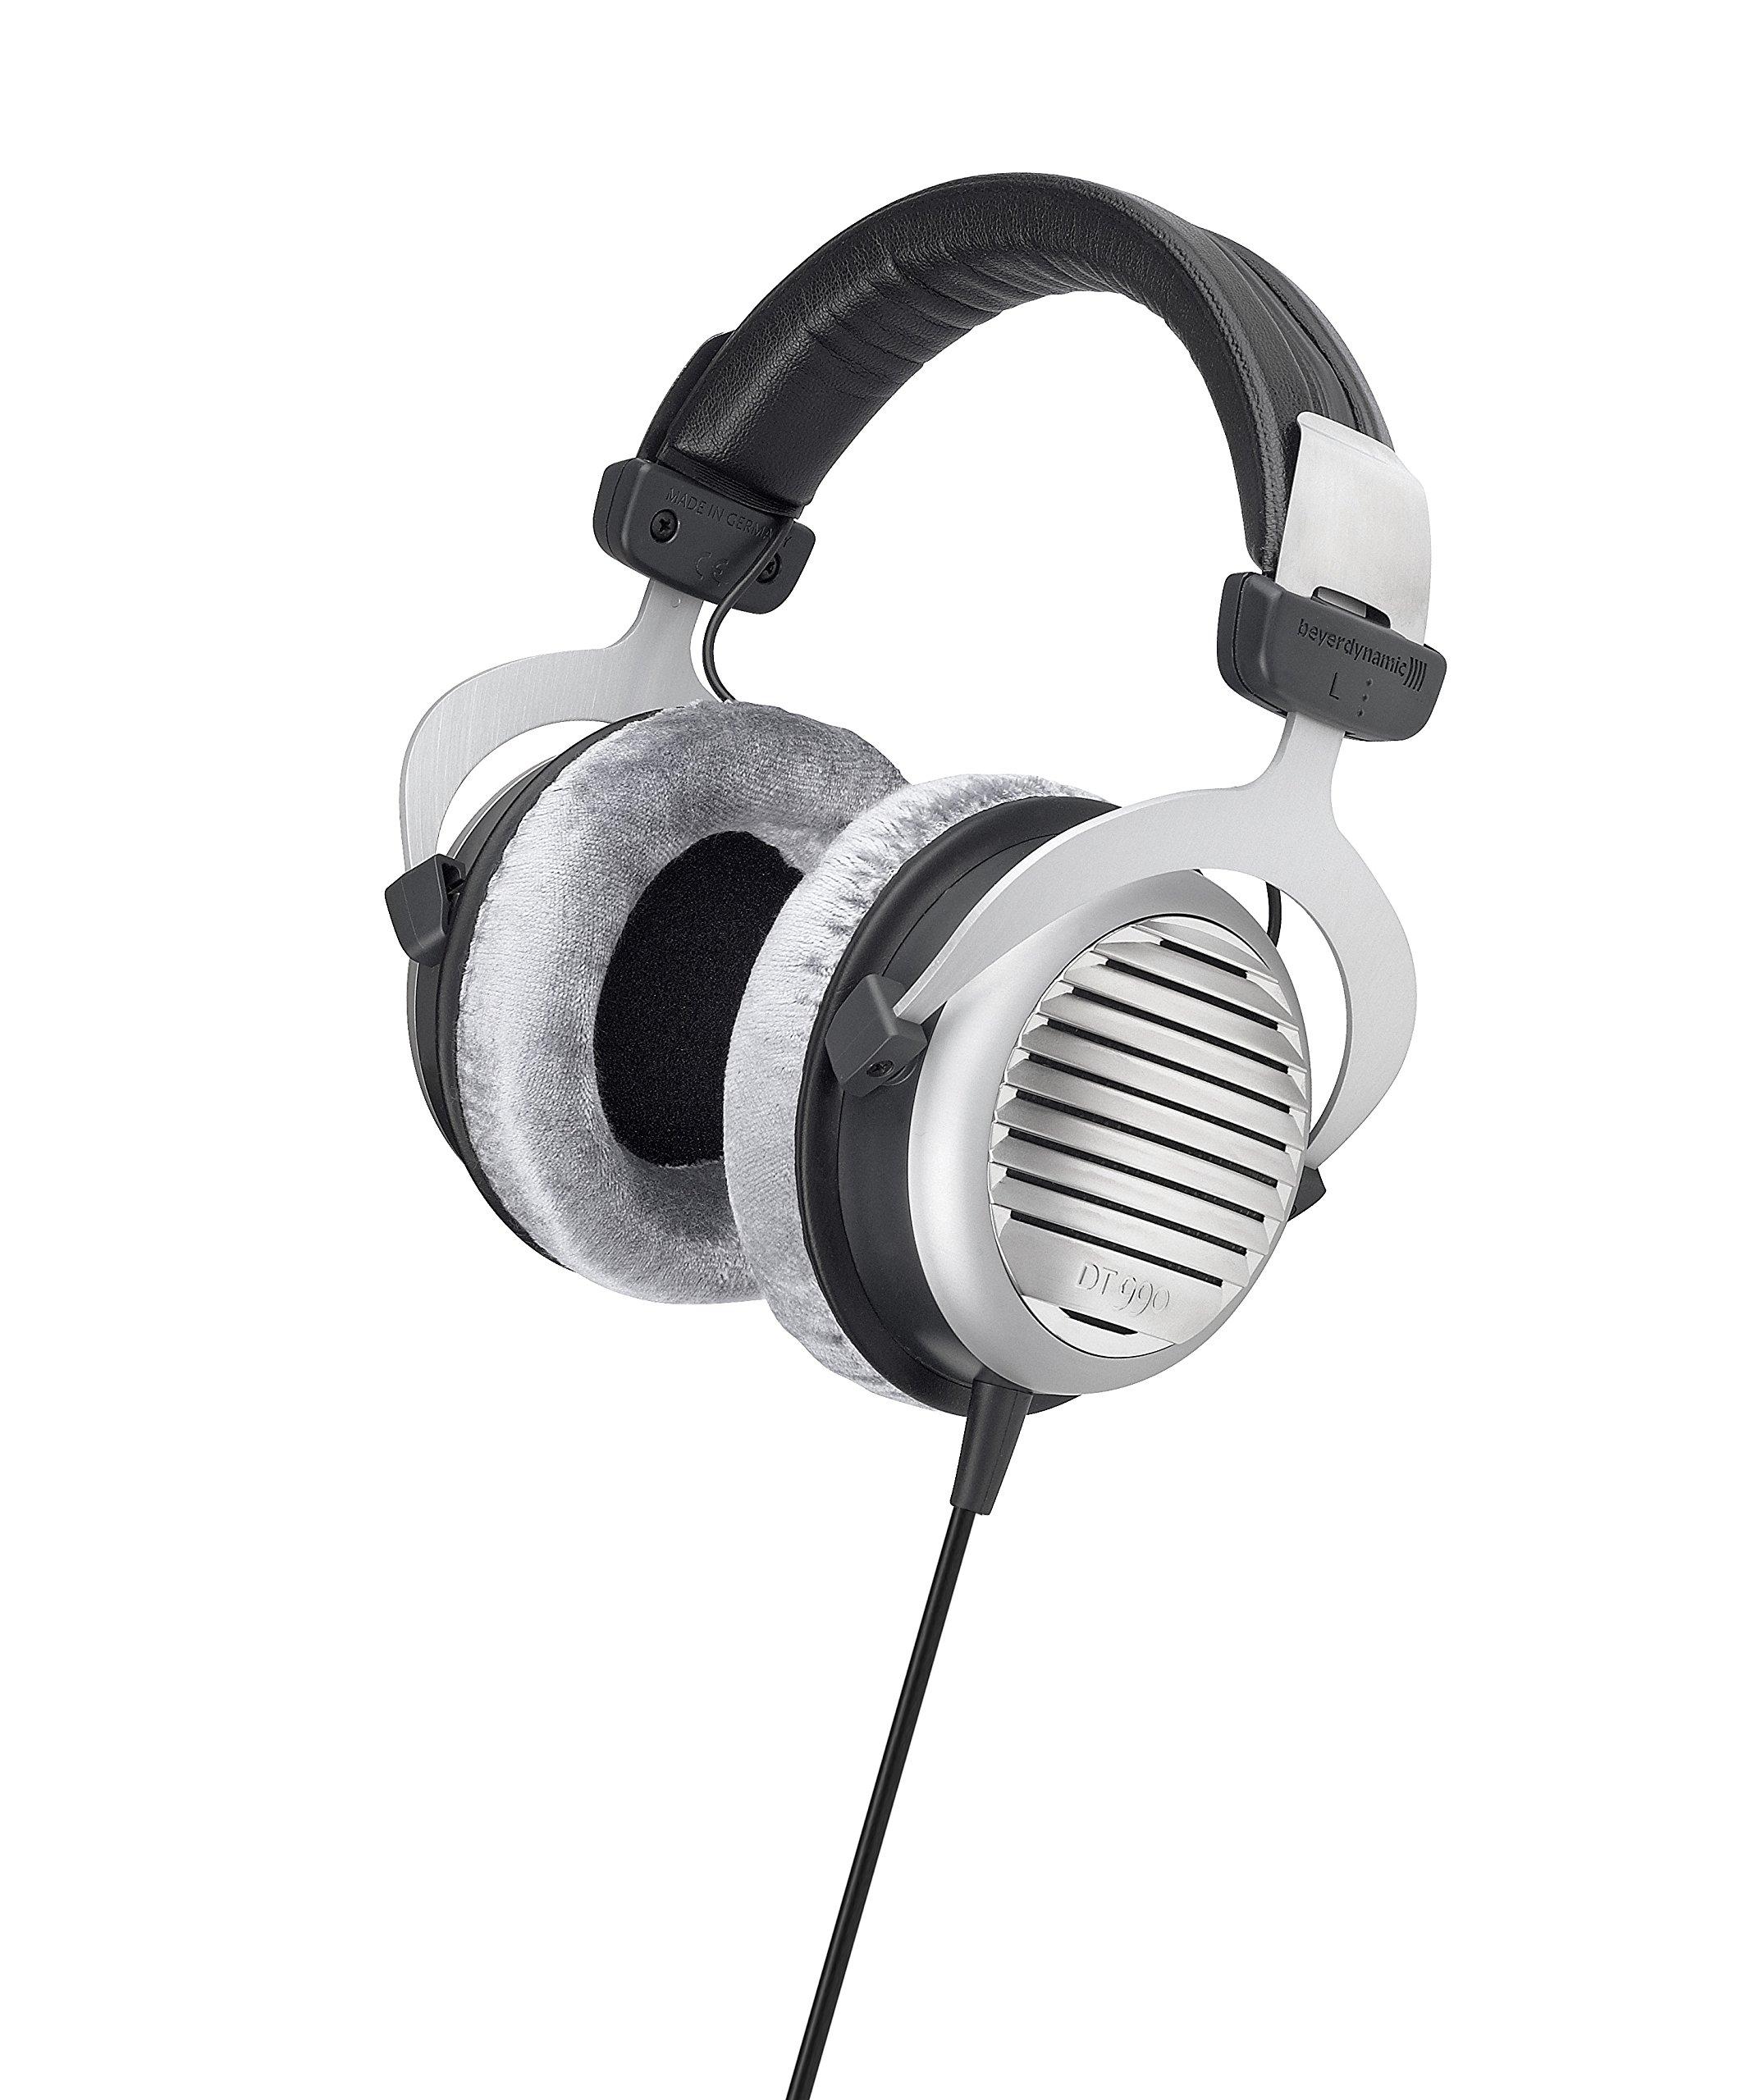 Beyerdynamic DT 990 Premium 32 ohm HiFi headphones by beyerdynamic (Image #1)